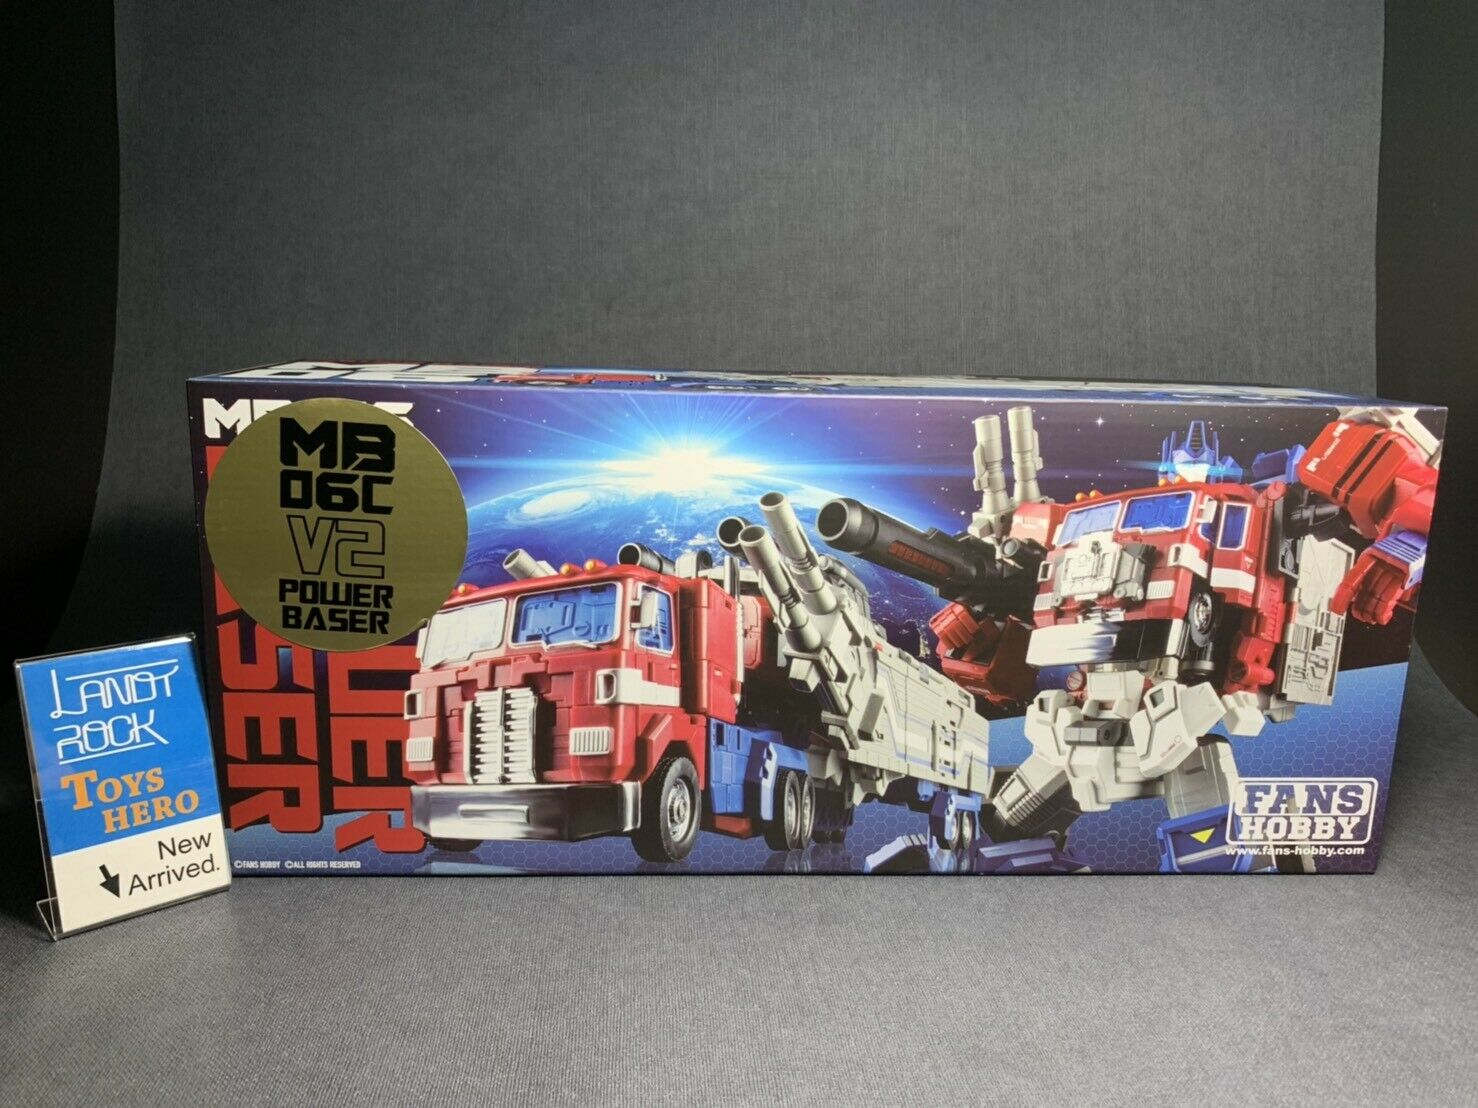 [ToysHero] In Hand Transformers FansHobby MB-06C PowerBaser PowerBaser PowerBaser Jinrai Optimus Prime f85